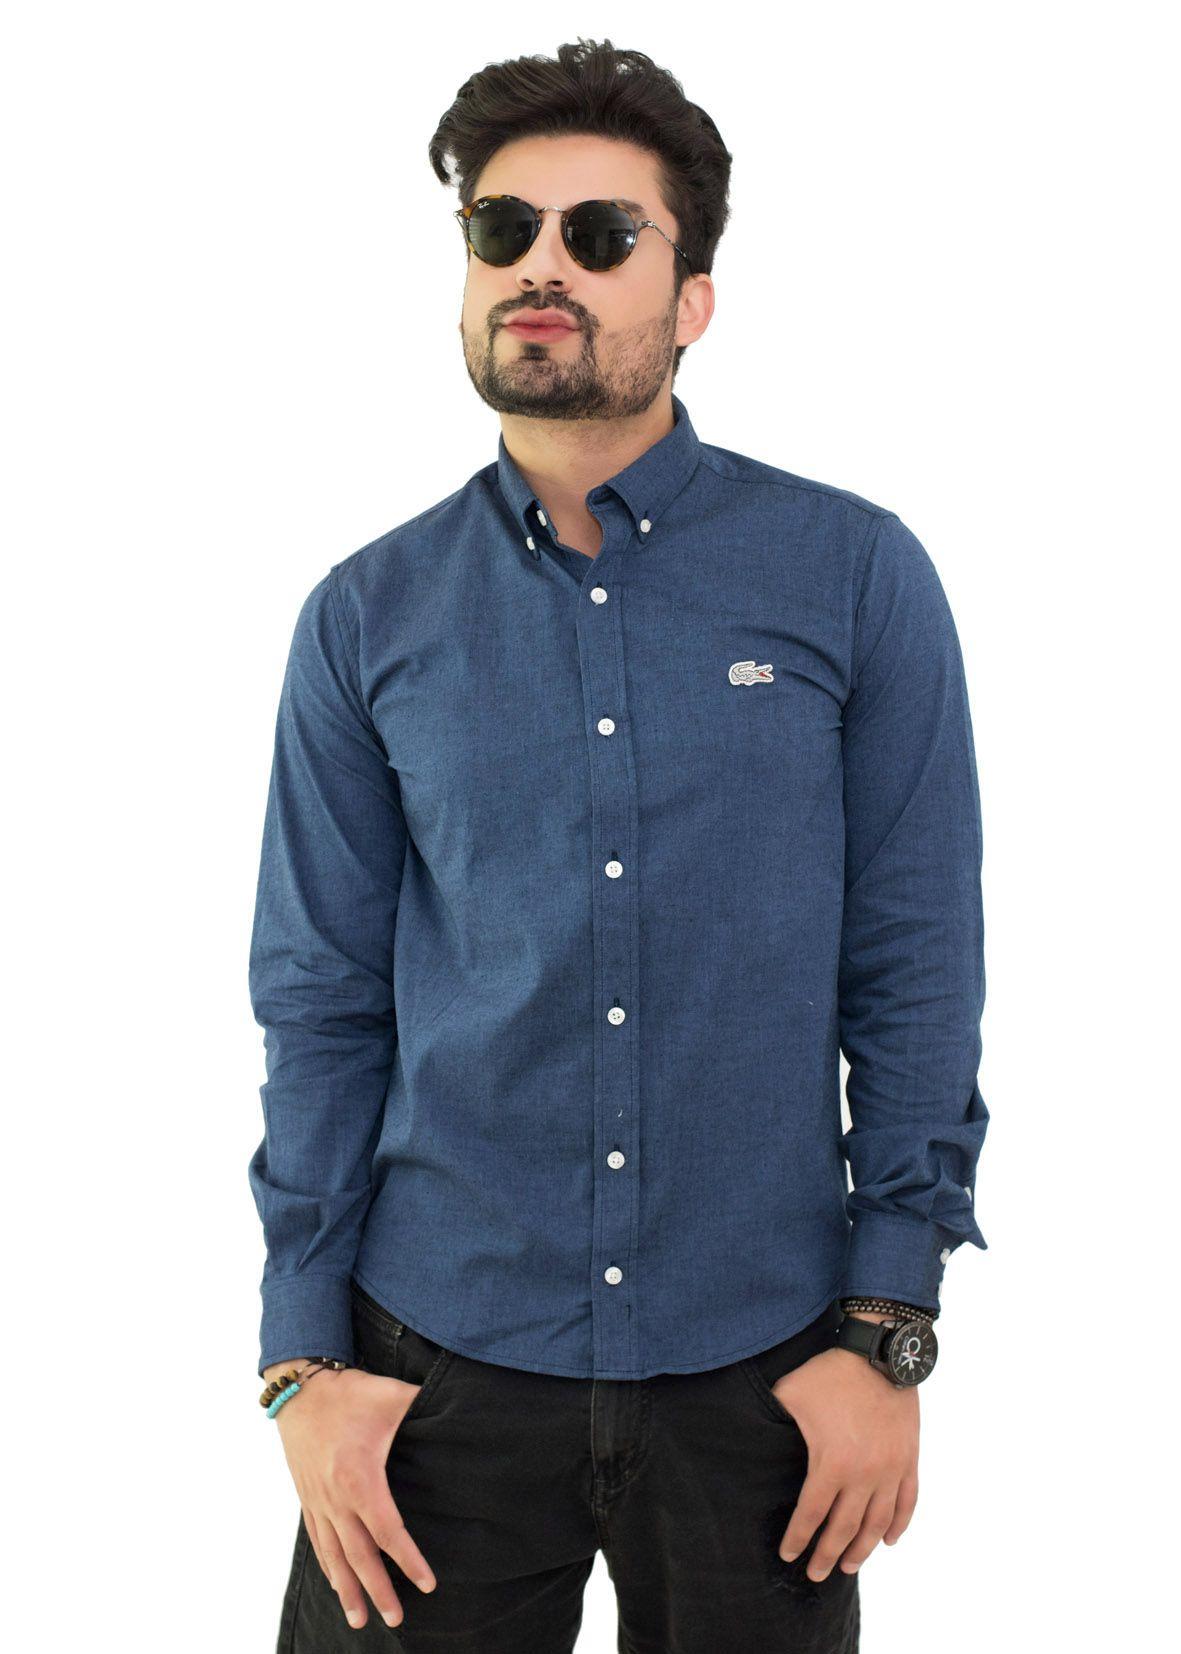 Camisa Social LCT Oxford Azul Marinho Mescla